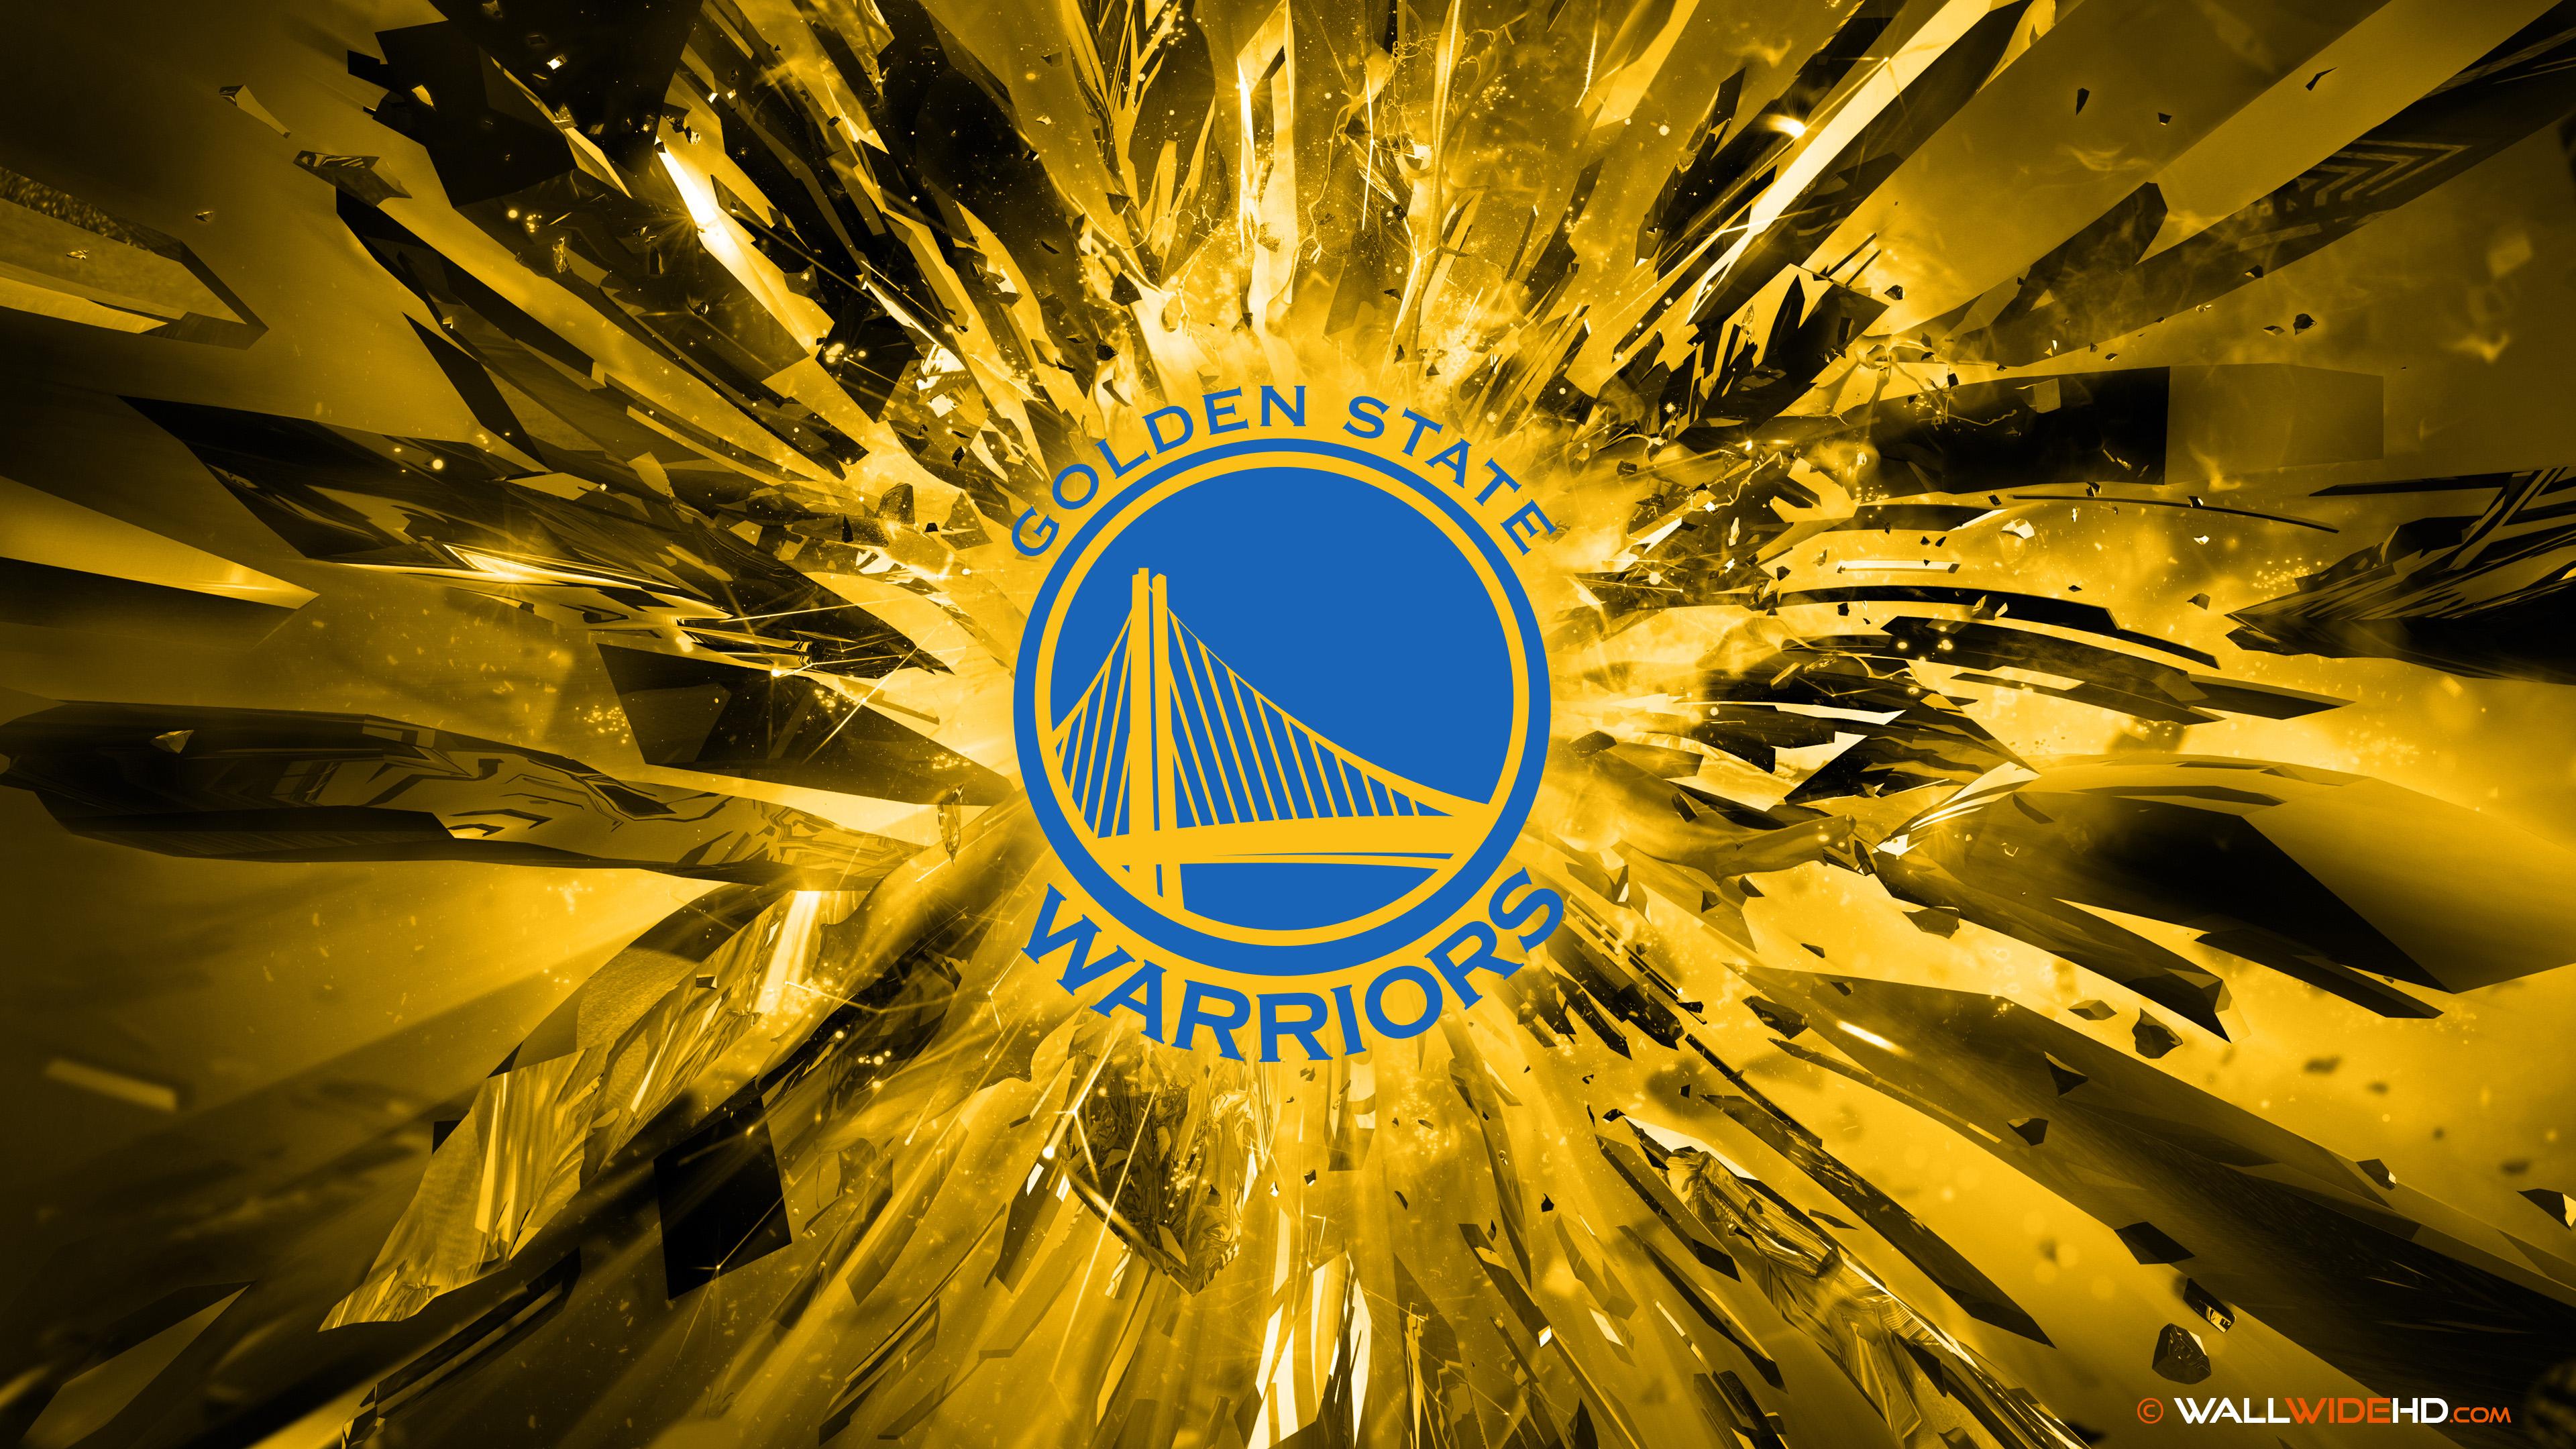 Golden State Warriors 2015 Logo 4K Wallpaper by wallpaperspalcom 3840x2160